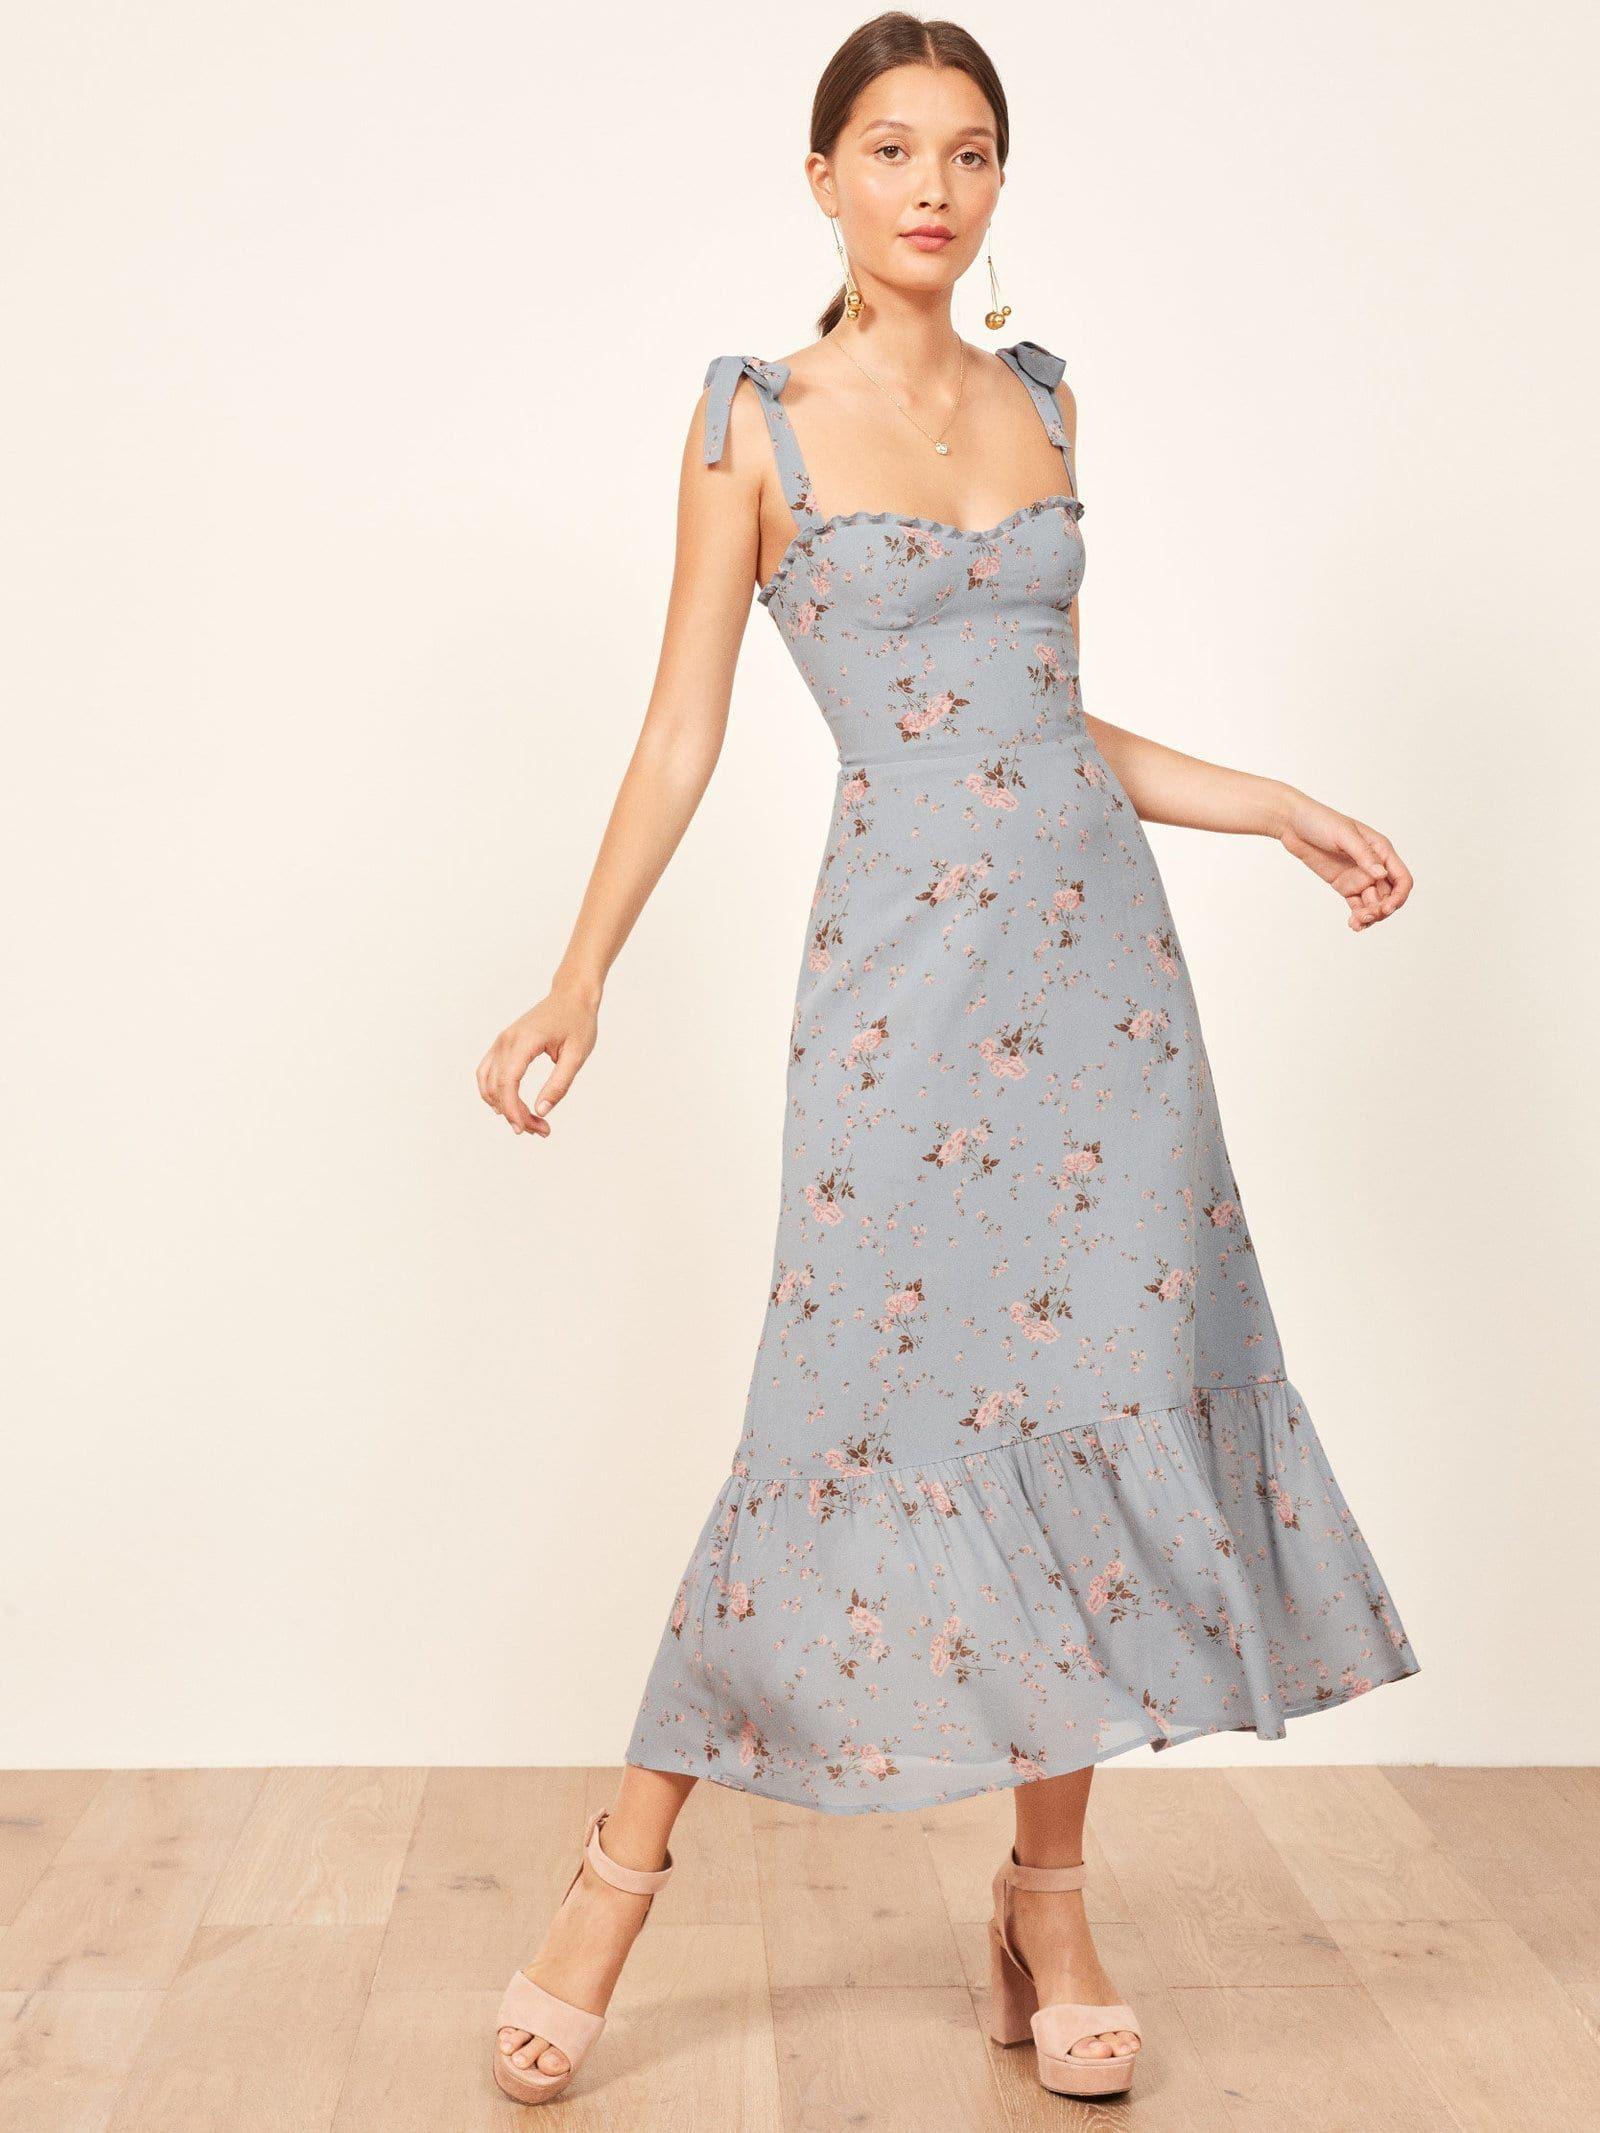 76a40aeeff3db REFORMATION Nikita Blue / Floral Printed Dress in 2019   Fashion ...